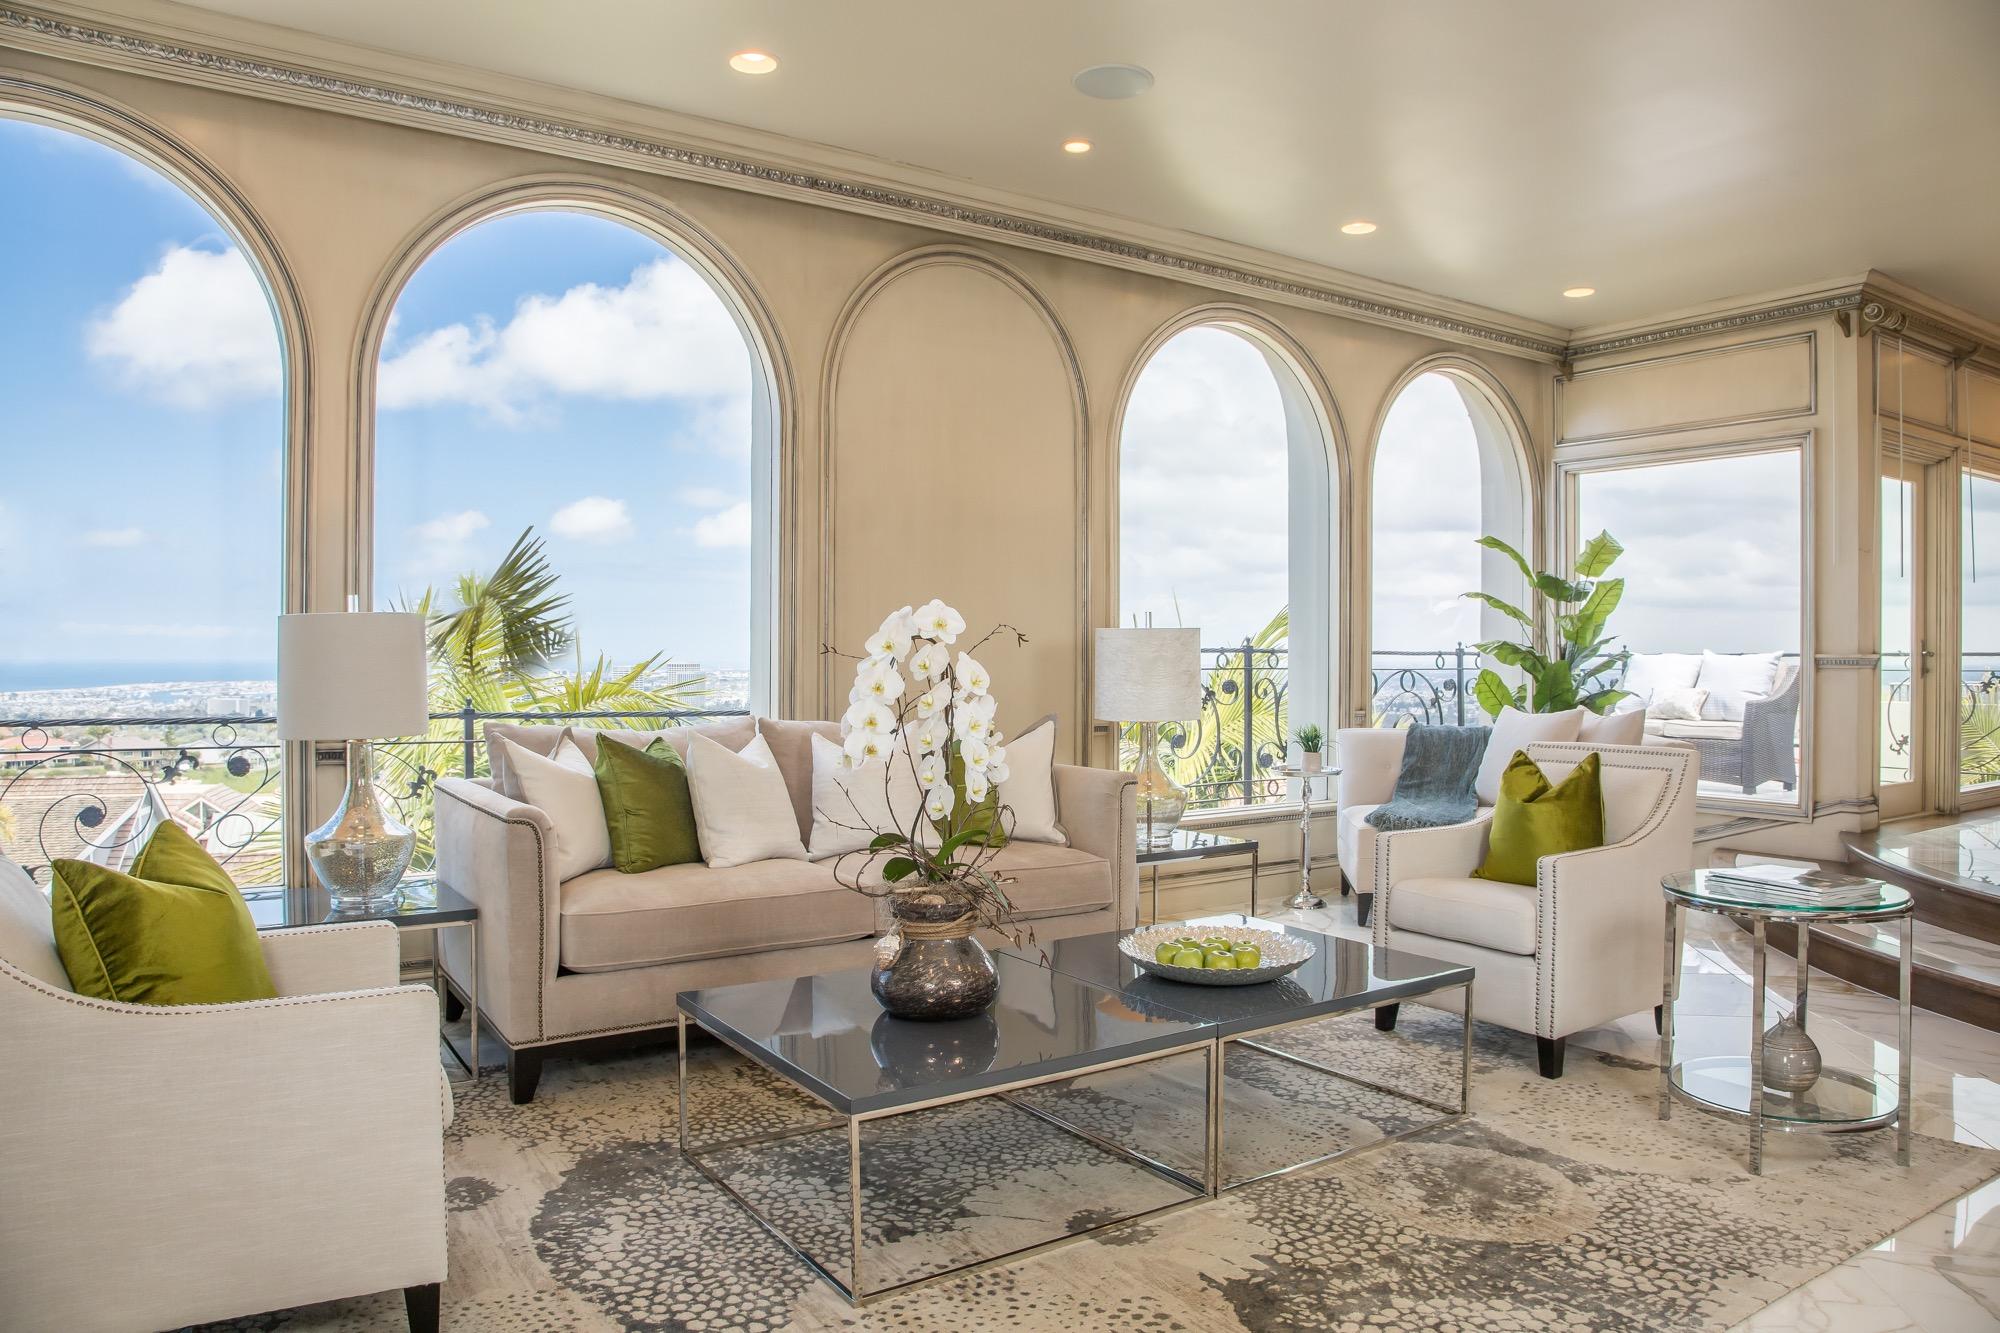 Coastal Furniture And Beach Decor White Orchid Interiors